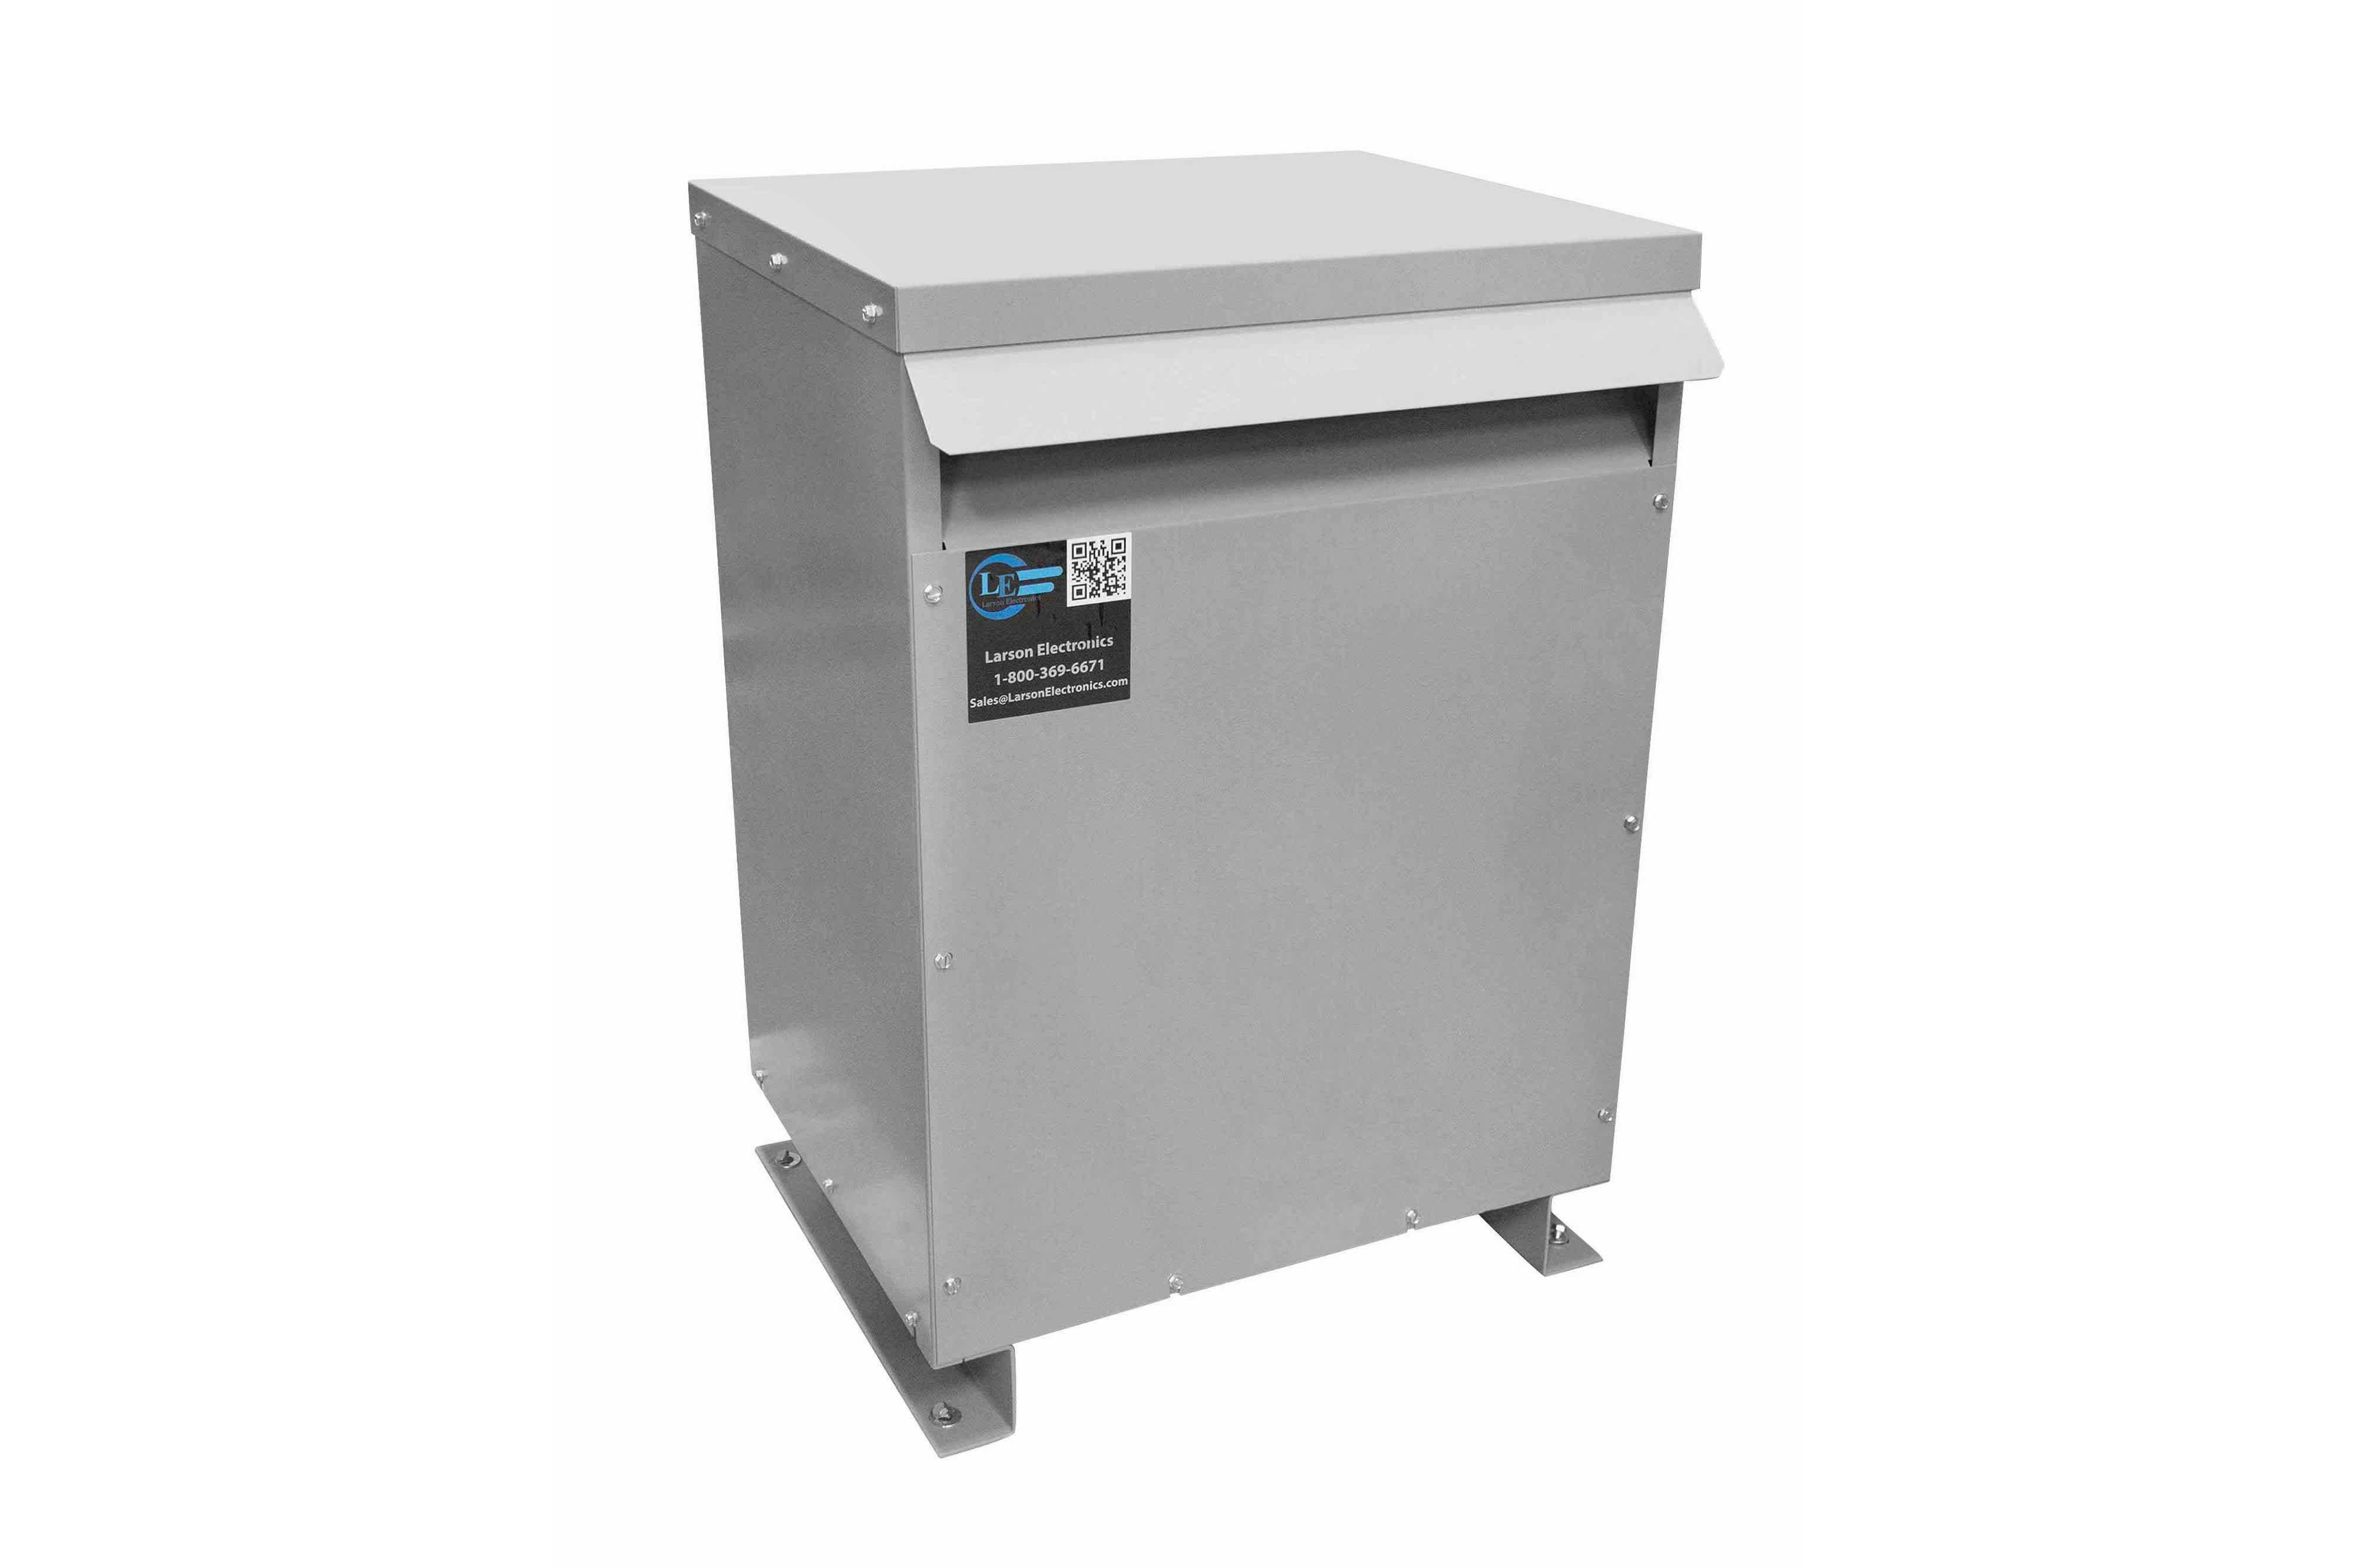 47.5 kVA 3PH Isolation Transformer, 240V Wye Primary, 600Y/347 Wye-N Secondary, N3R, Ventilated, 60 Hz